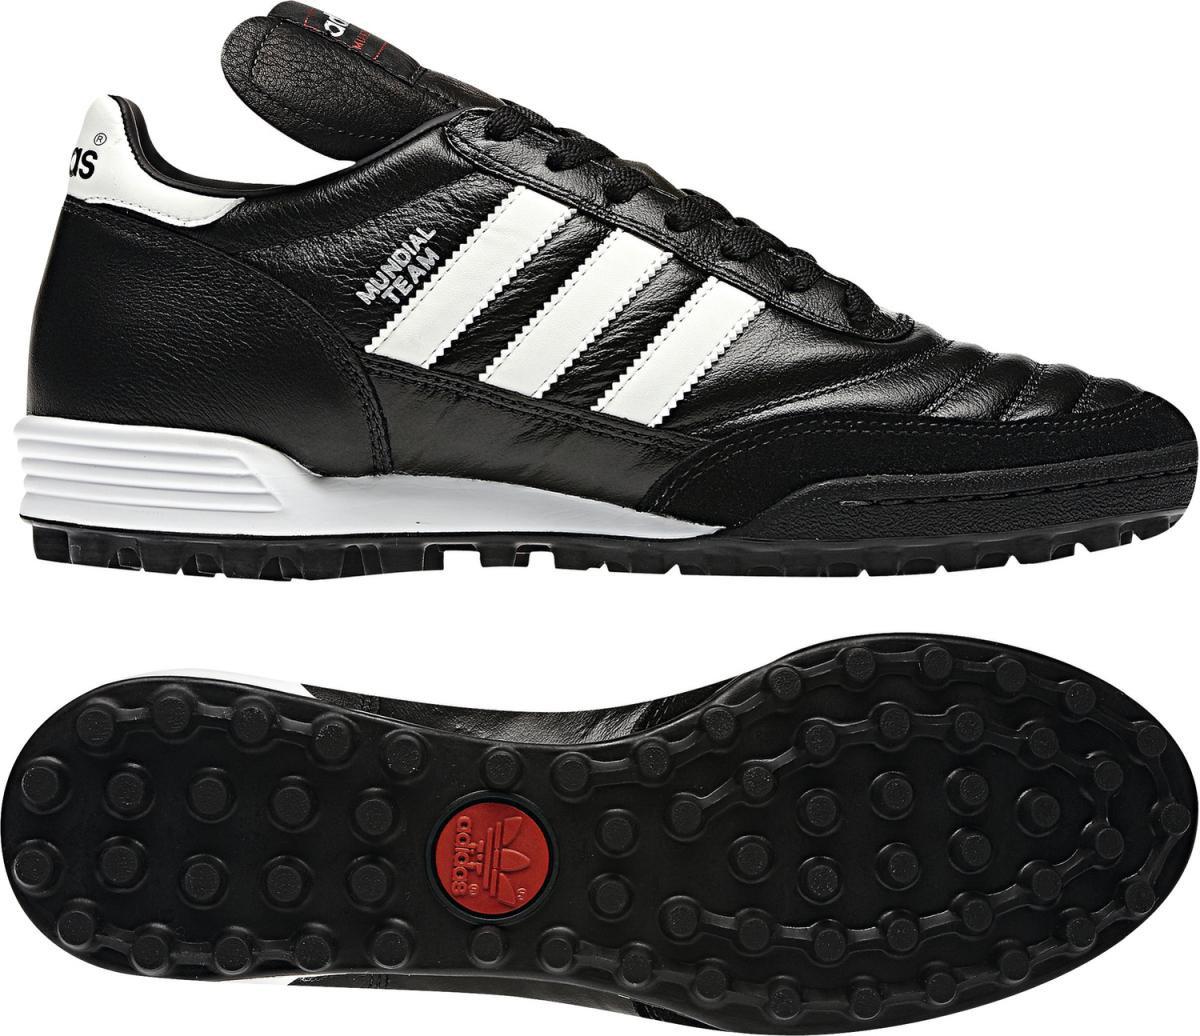 super popular 740ec d7129 Adidas Mundial Team günstig online bei Preis.de bestelllen✓